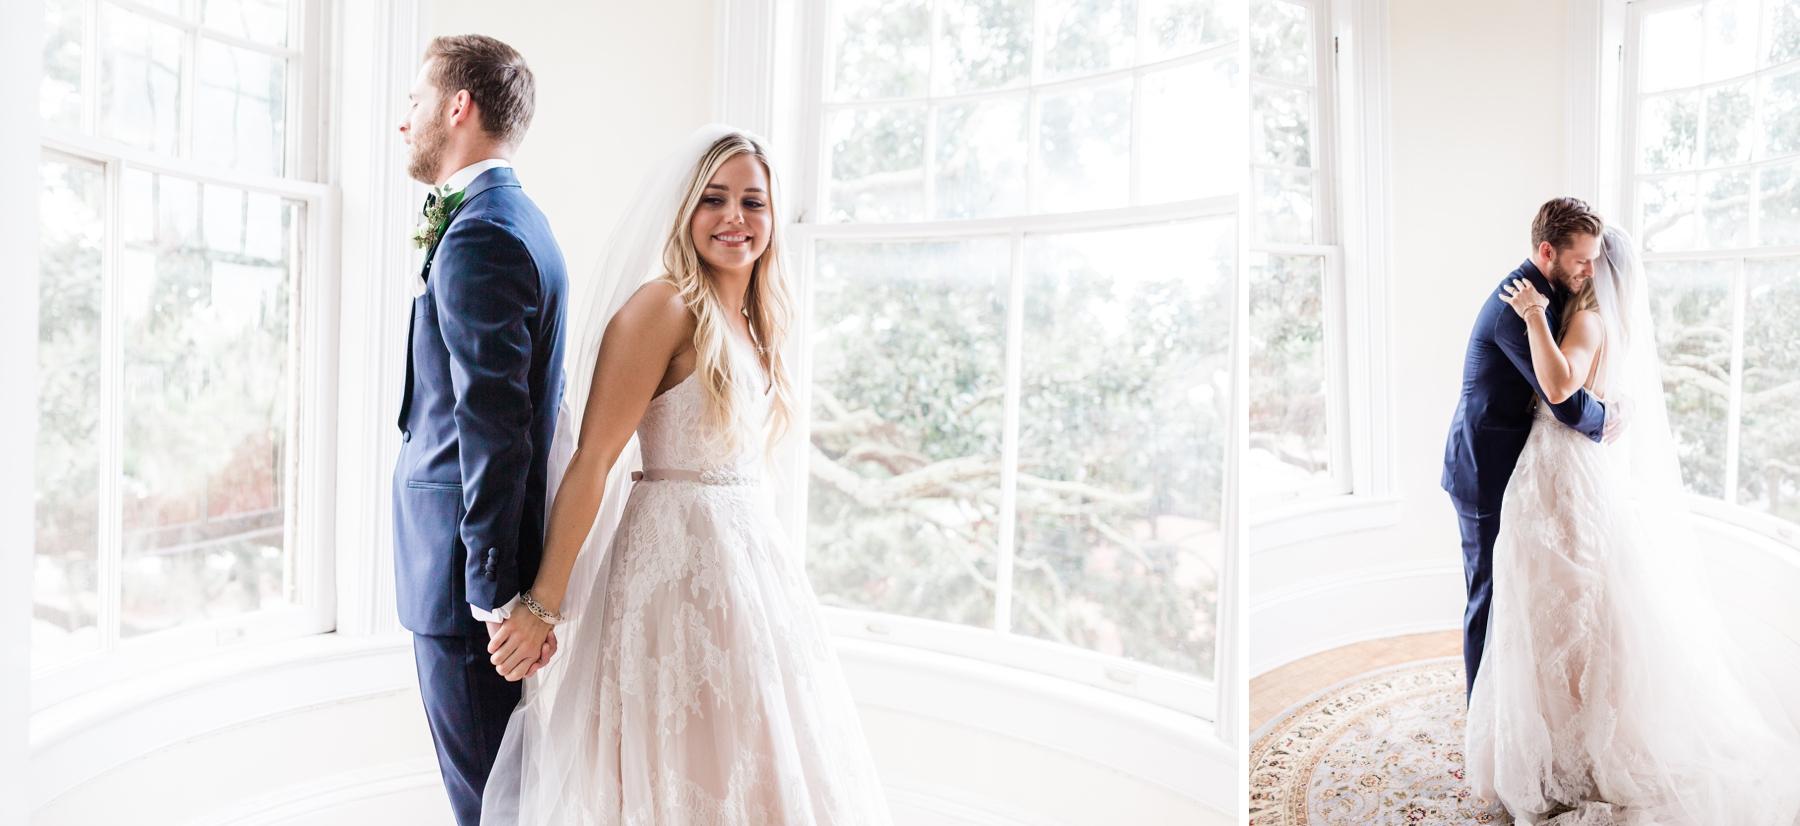 Apt-B-Photography-Maddy-Jon-savannah-wedding-photographer-2.jpg